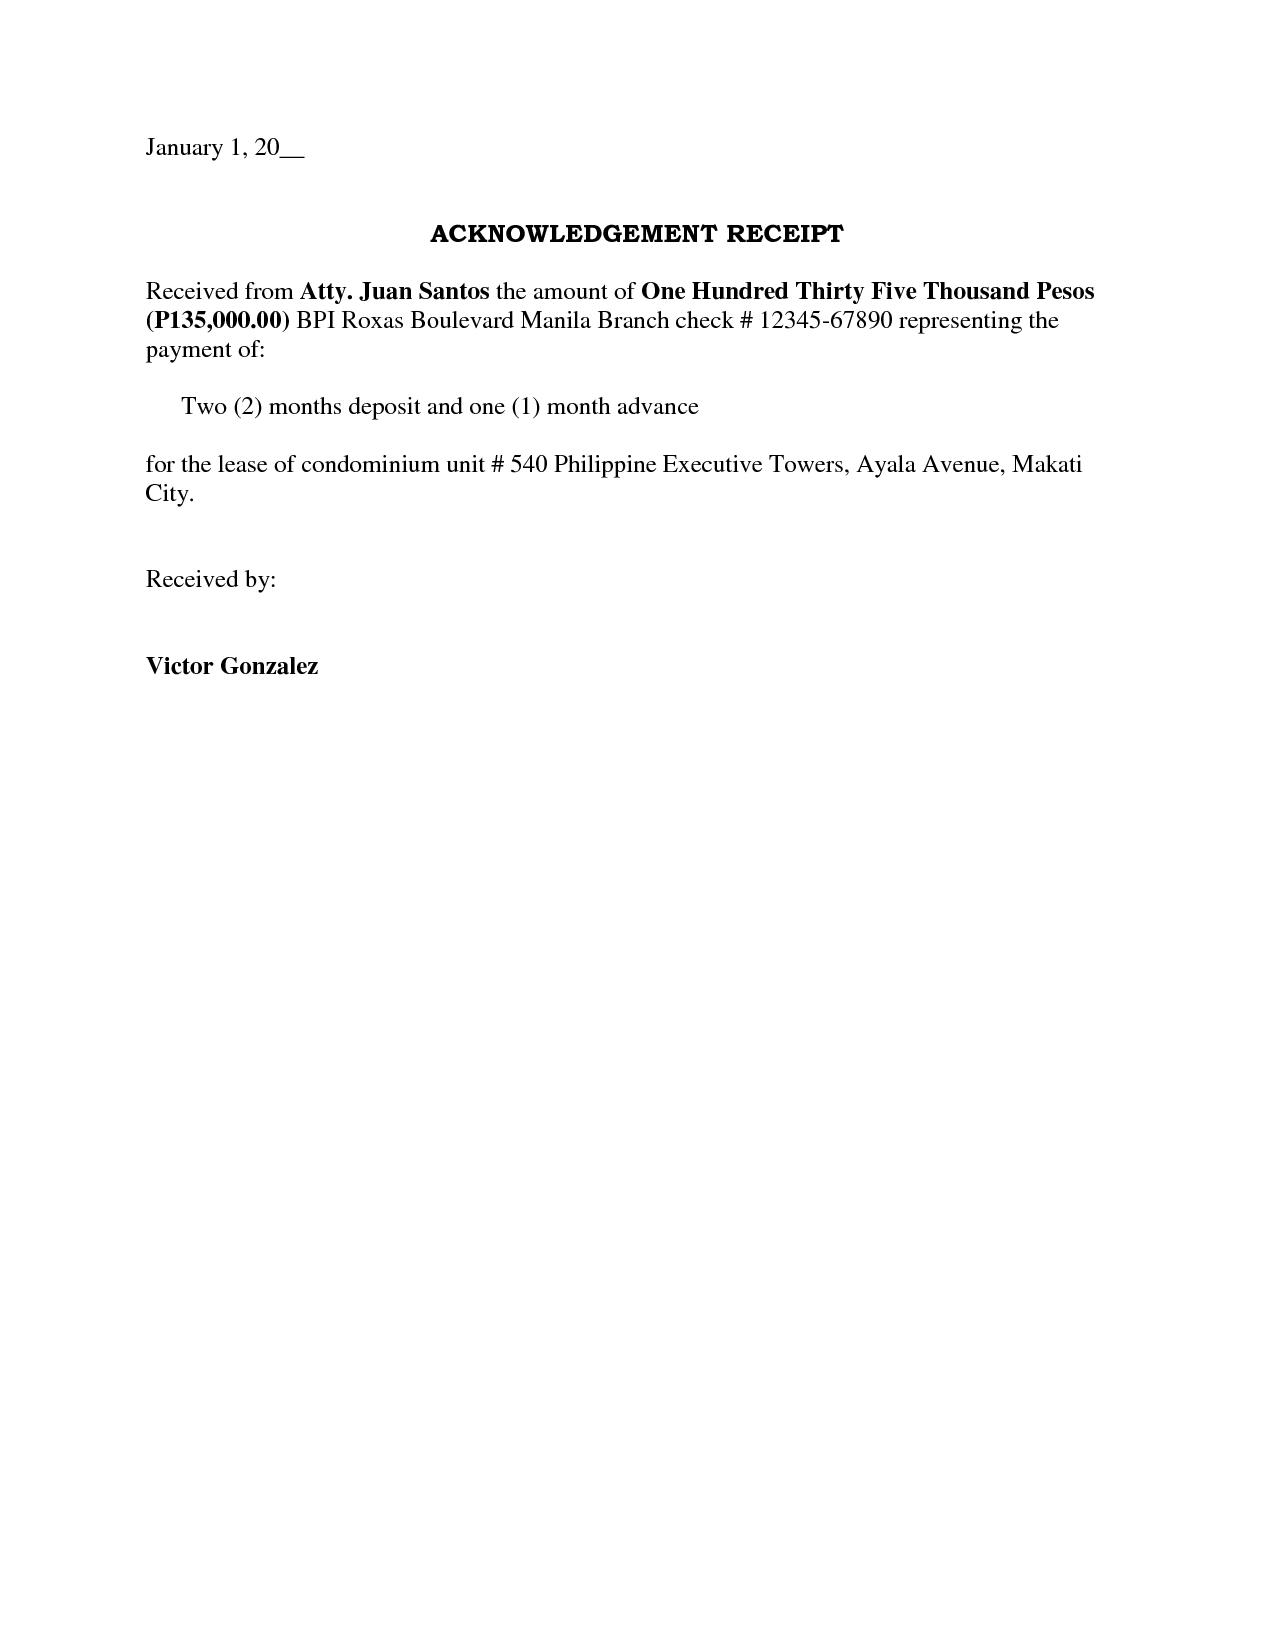 Acknowledgement Receipt Letter Template.Editable Payment Receipt Letter And Acknowledgement Of